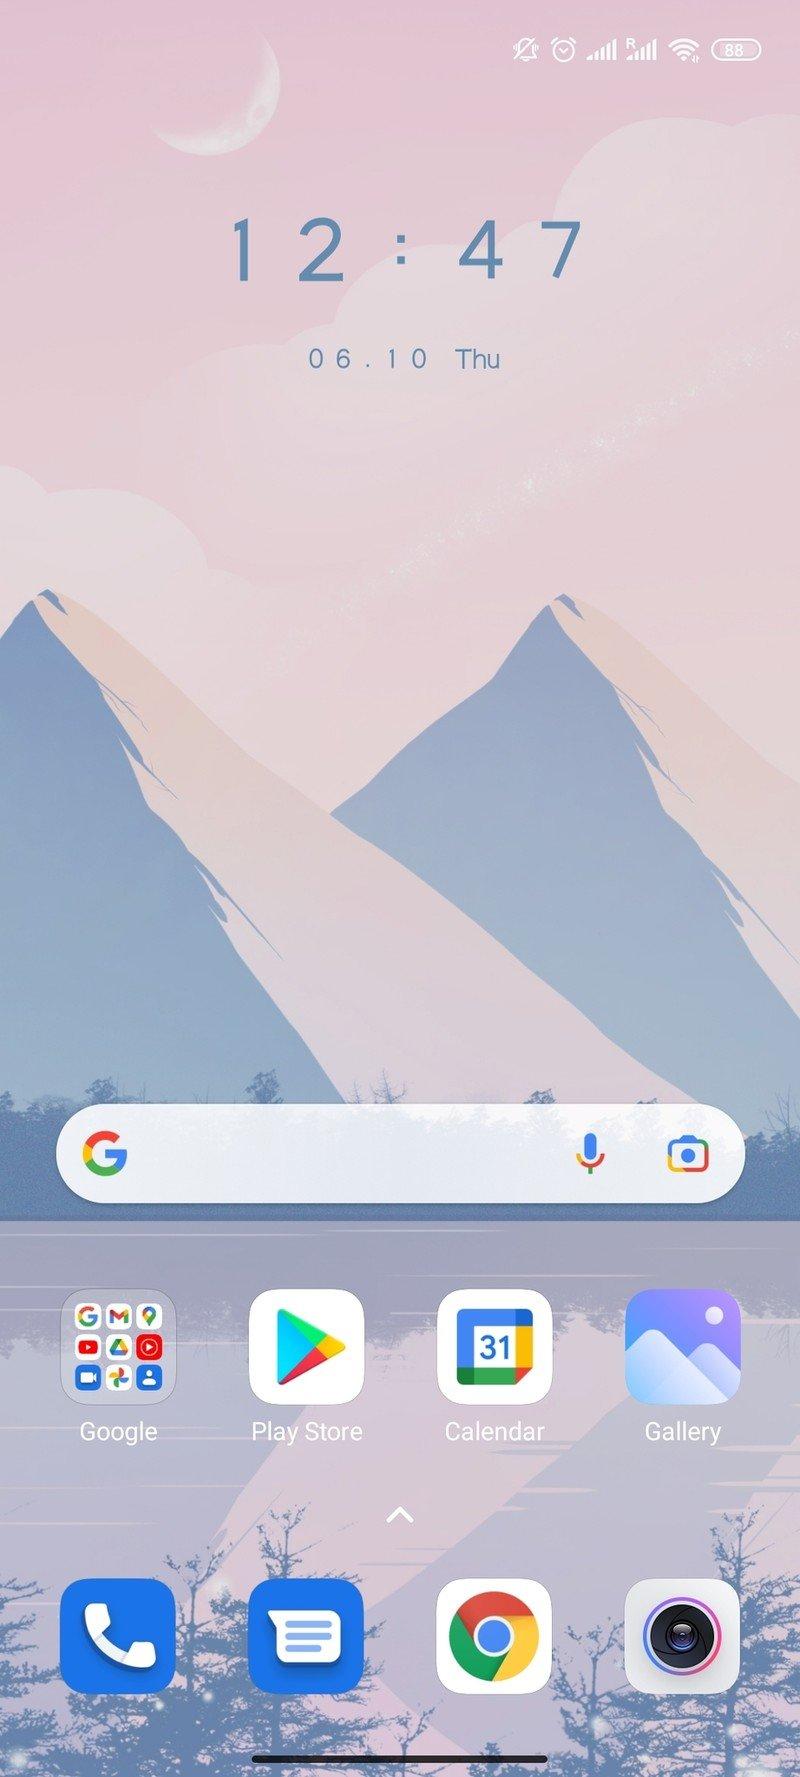 android-11-home-screenshot.jpg